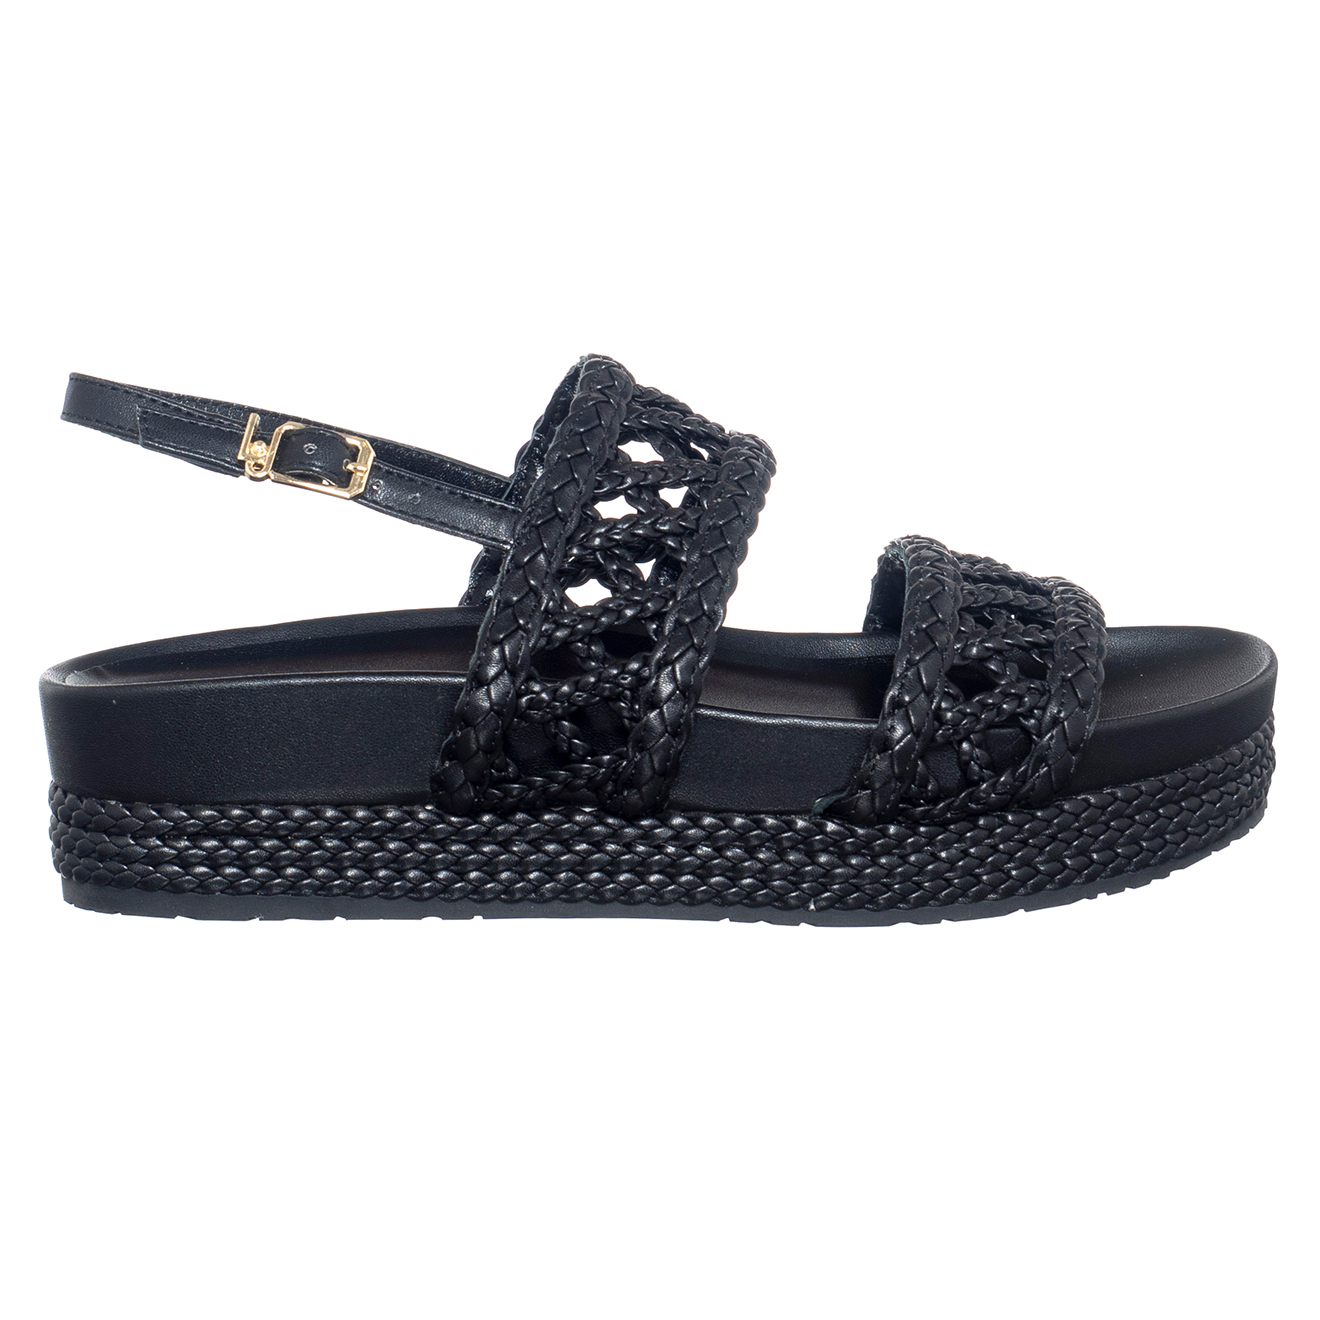 Sandales en Cuir Patty noires - Talon 4 cm - Liu-Jo - Modalova